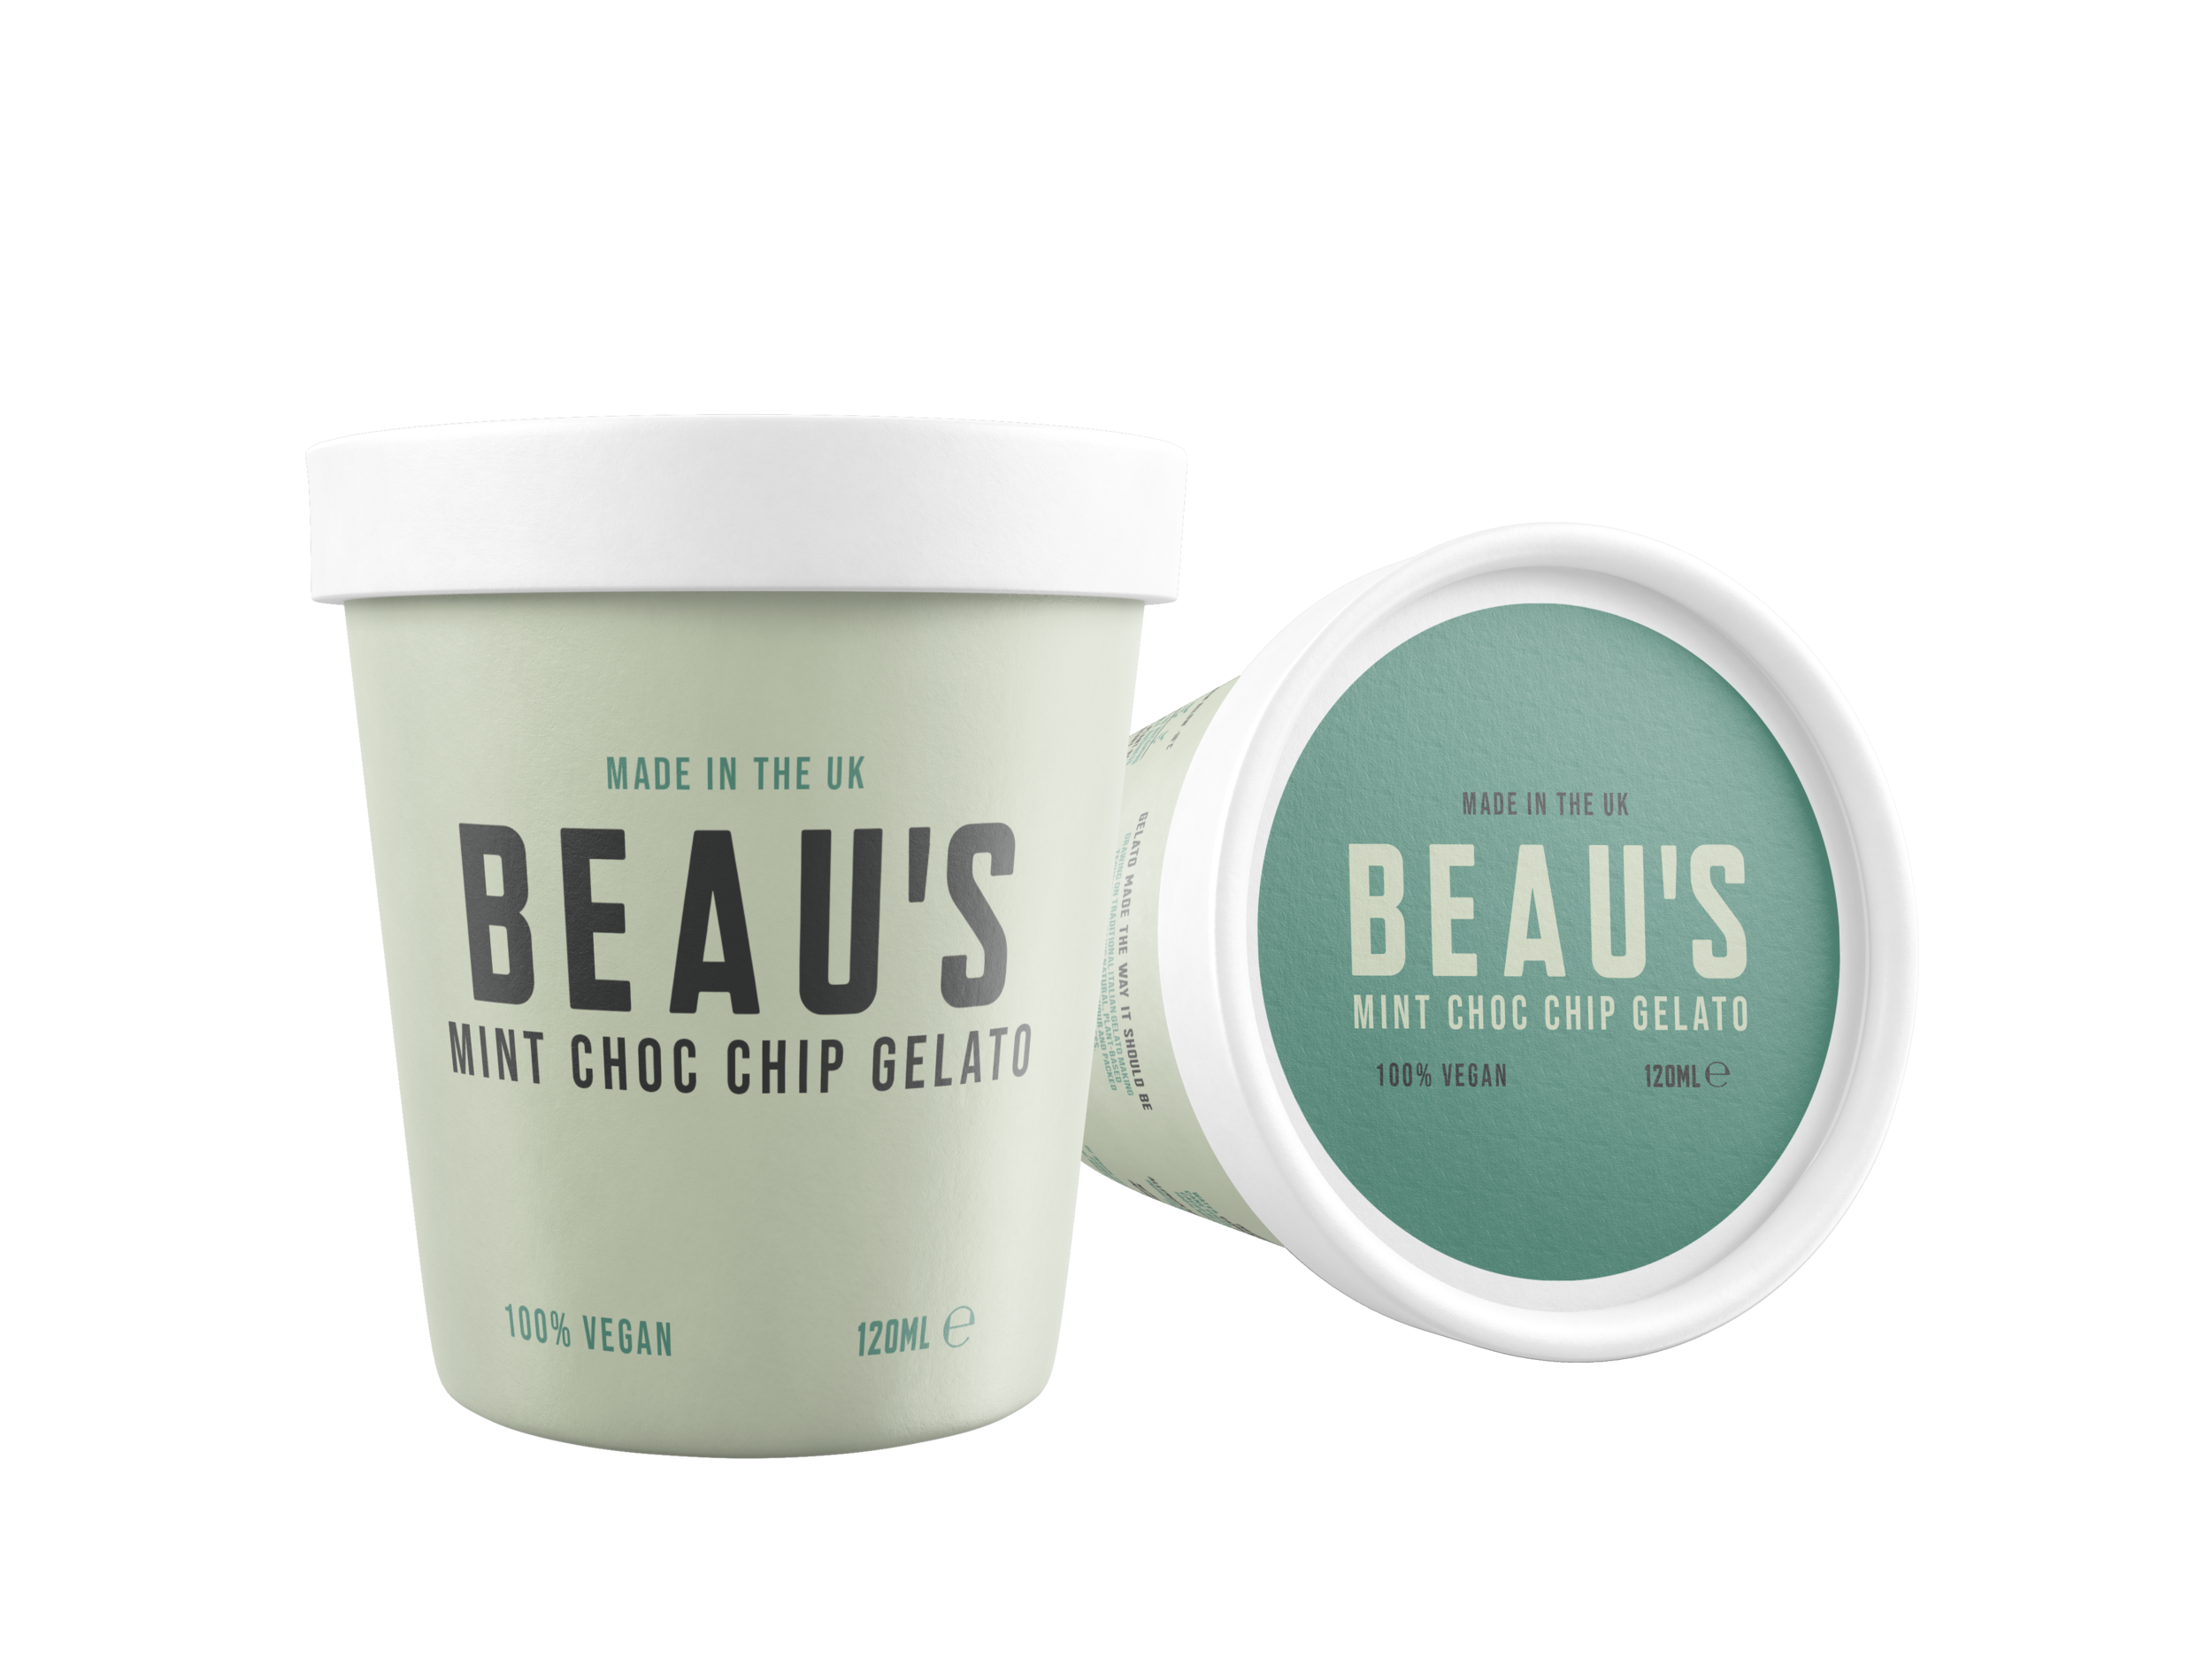 Beau's Mint Choc Chip 120ml tub design